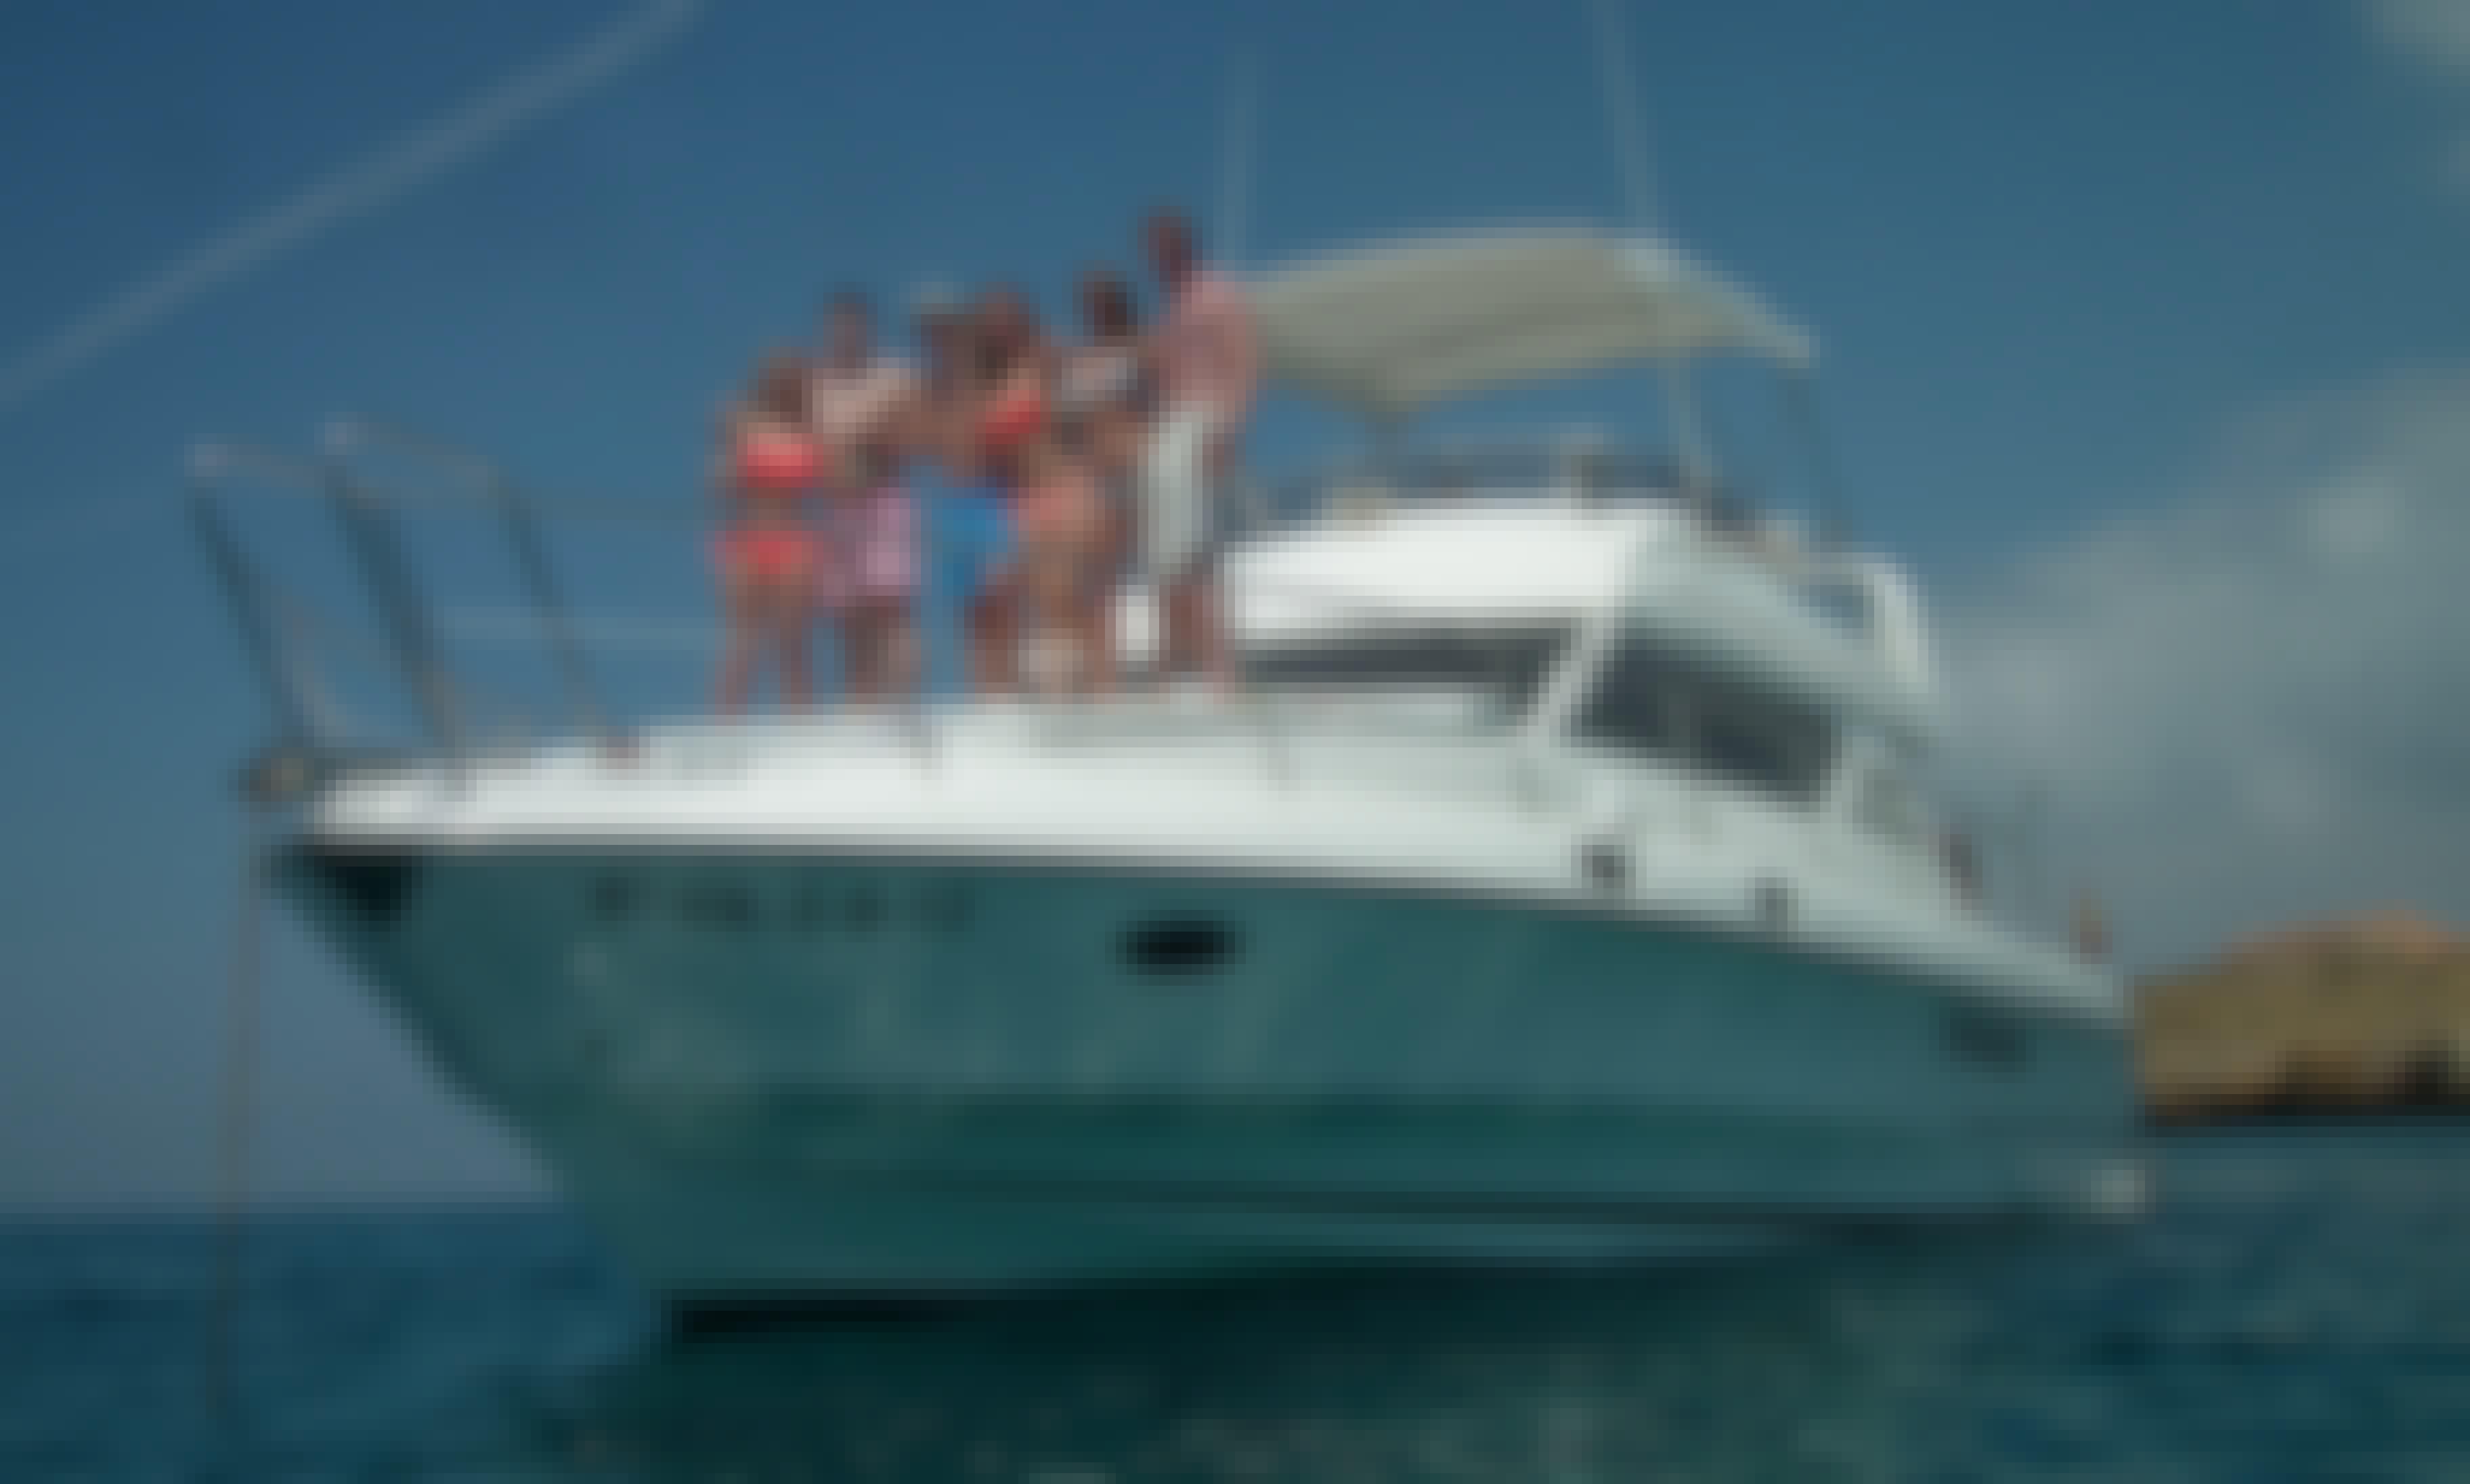 48' Birchwood Motor Yacht Rental in Alacant, Spain